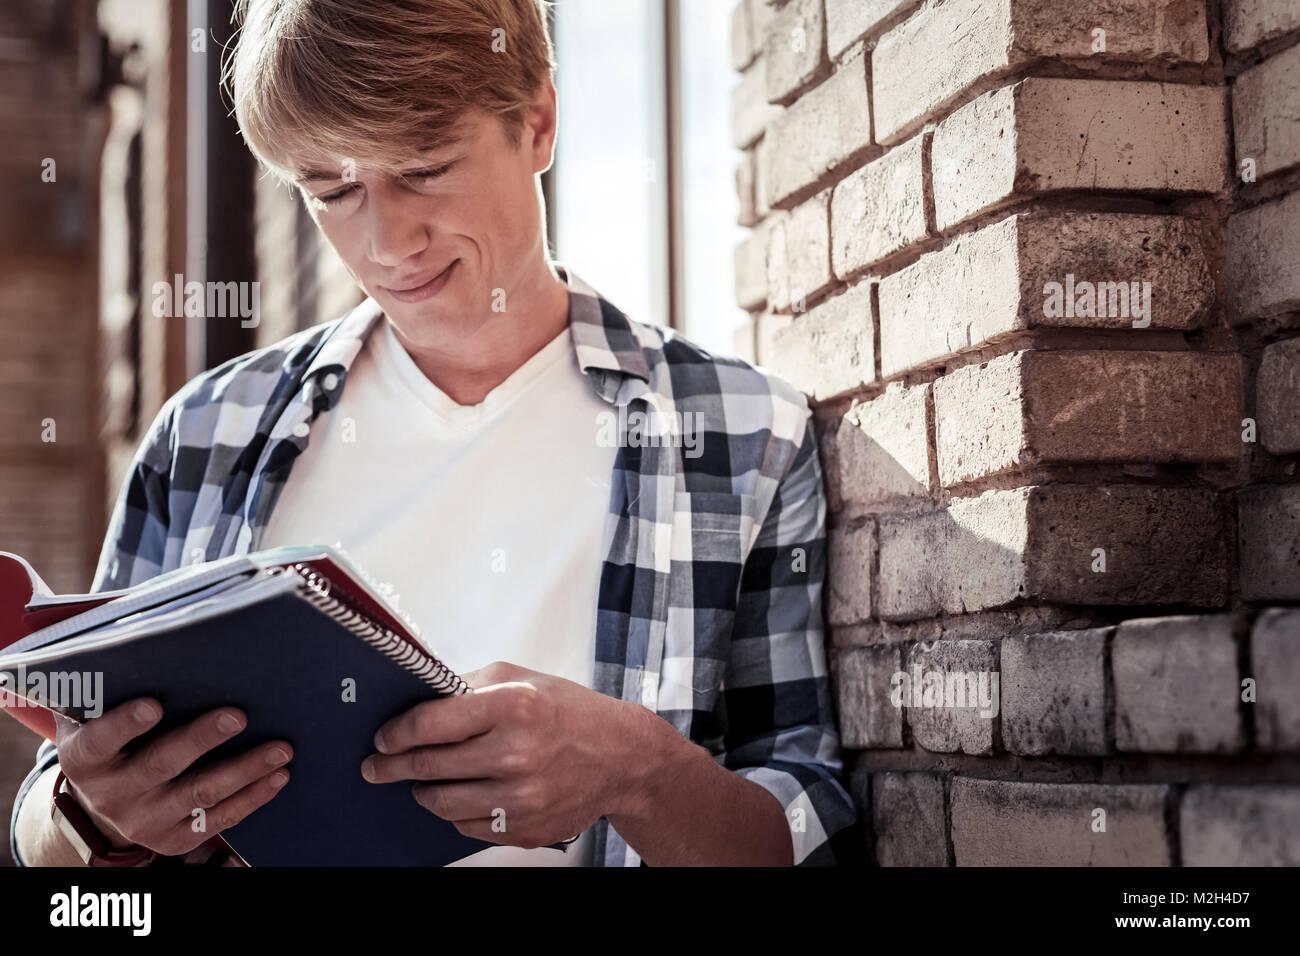 Positive joyful student reading his notes - Stock Image